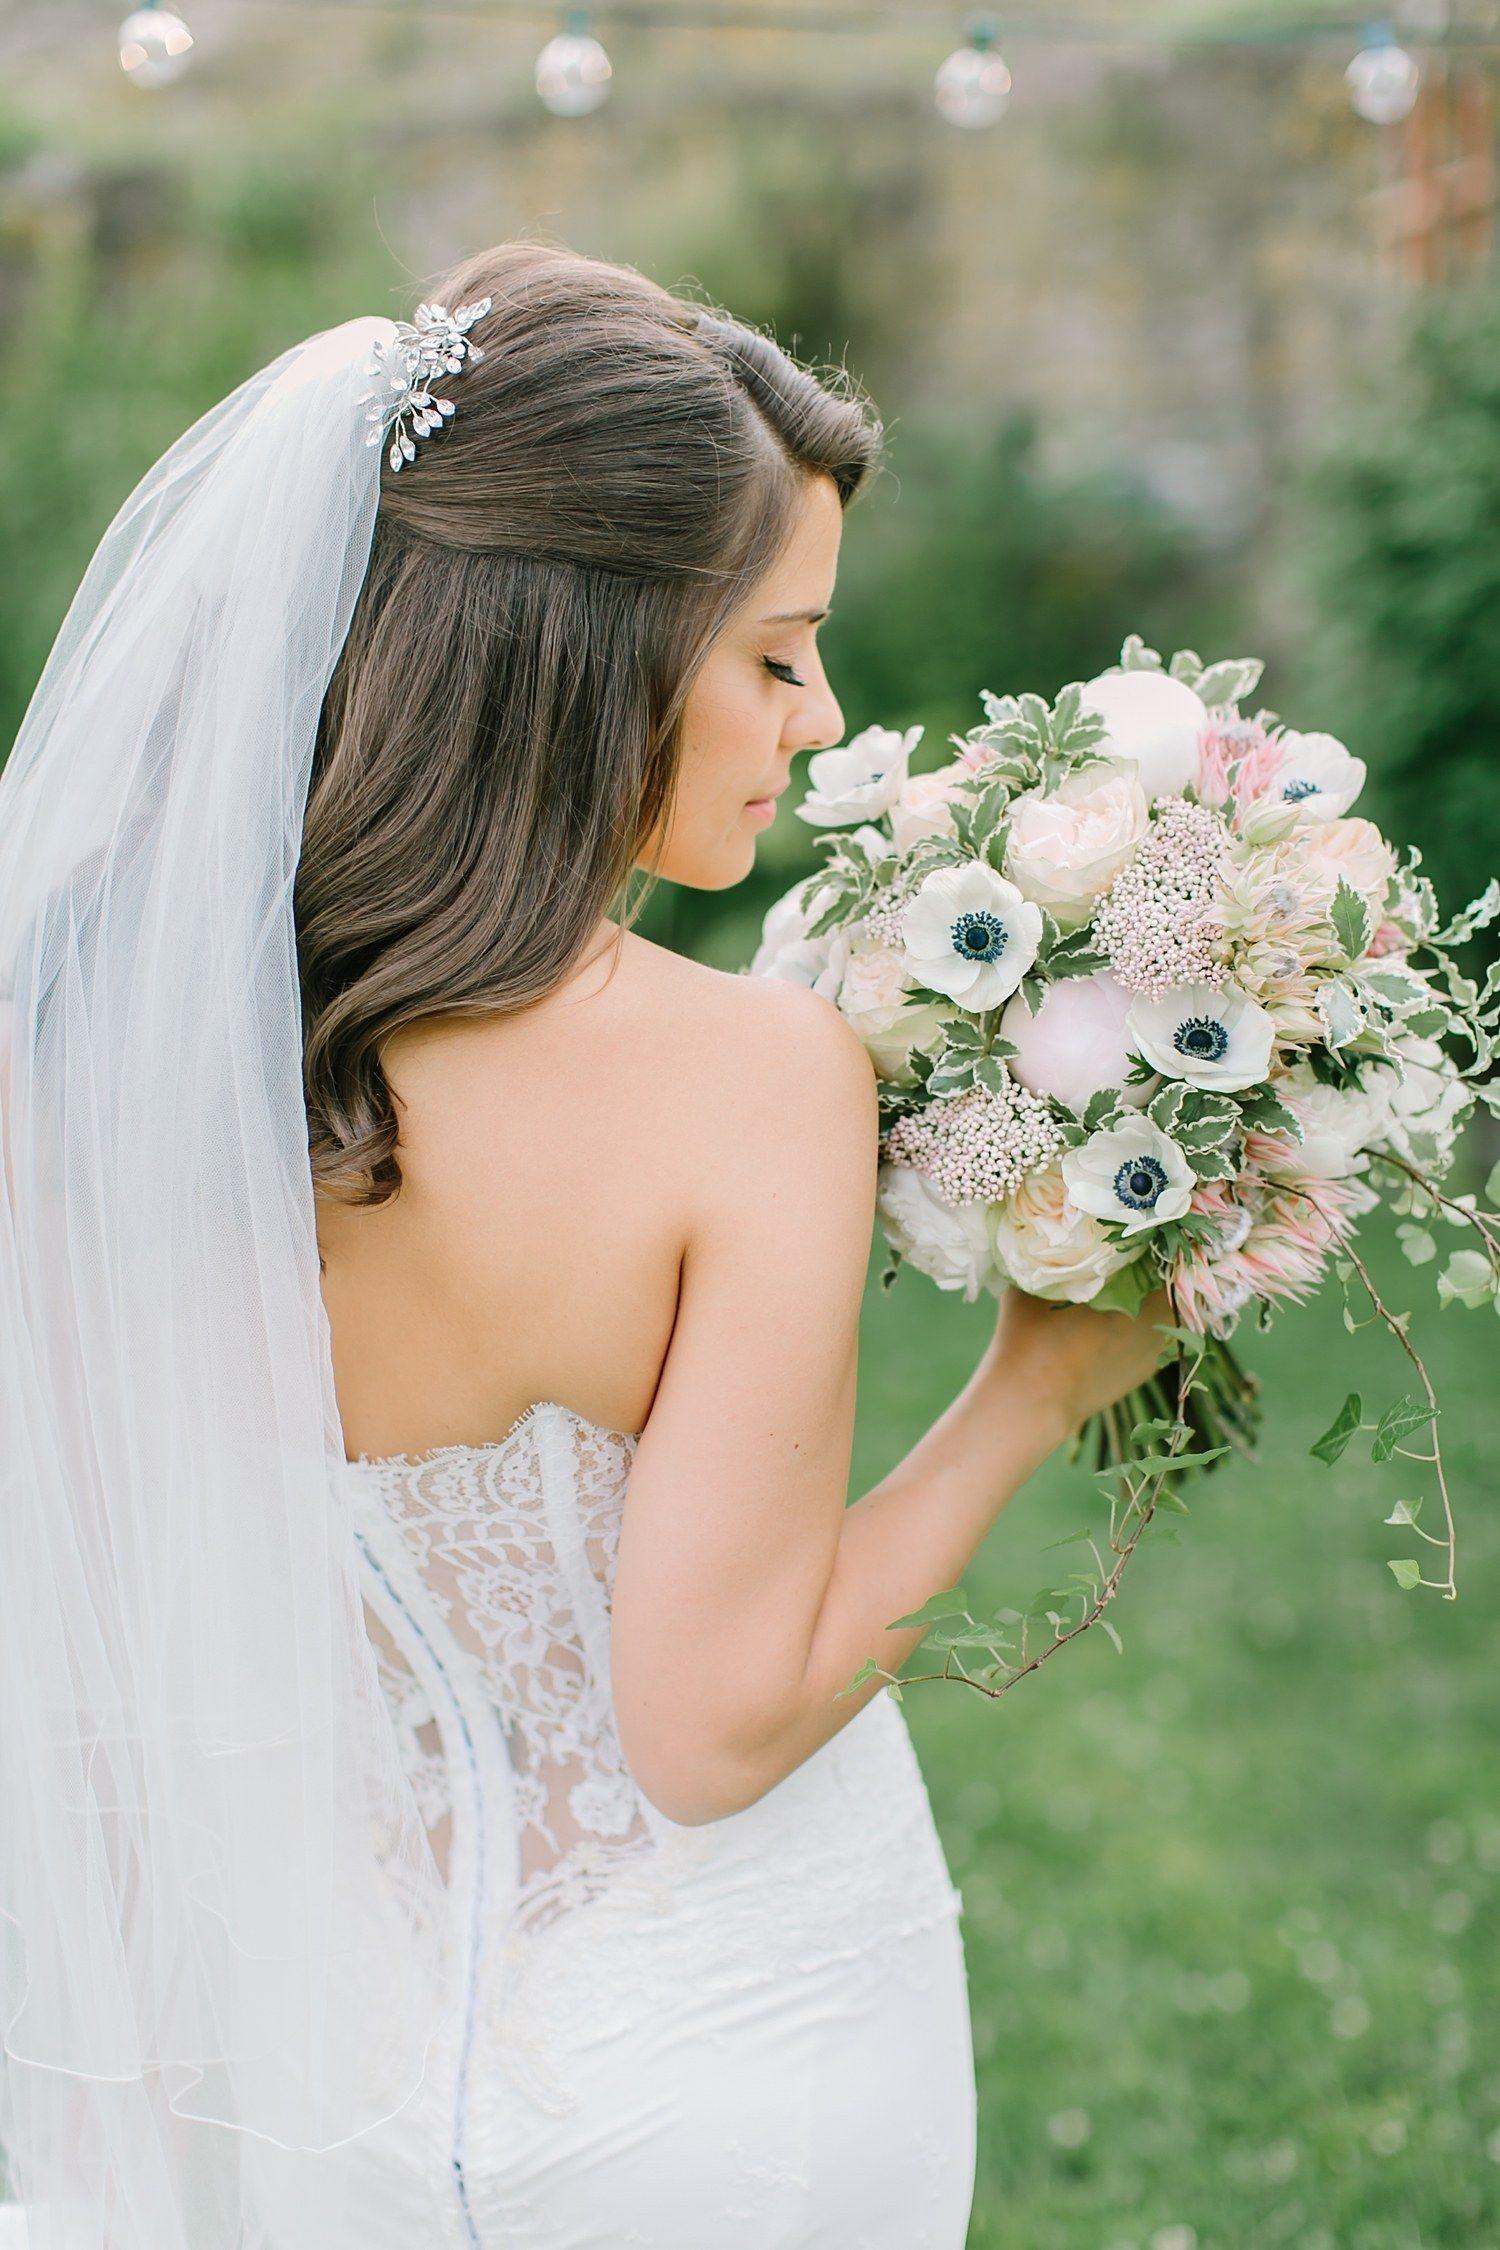 Half Up Half Down Wedding Hairstyles For Every Type Of Bride Brides Half Up Wedding Hair Bridal Hair Half Up Wedding Hair Half